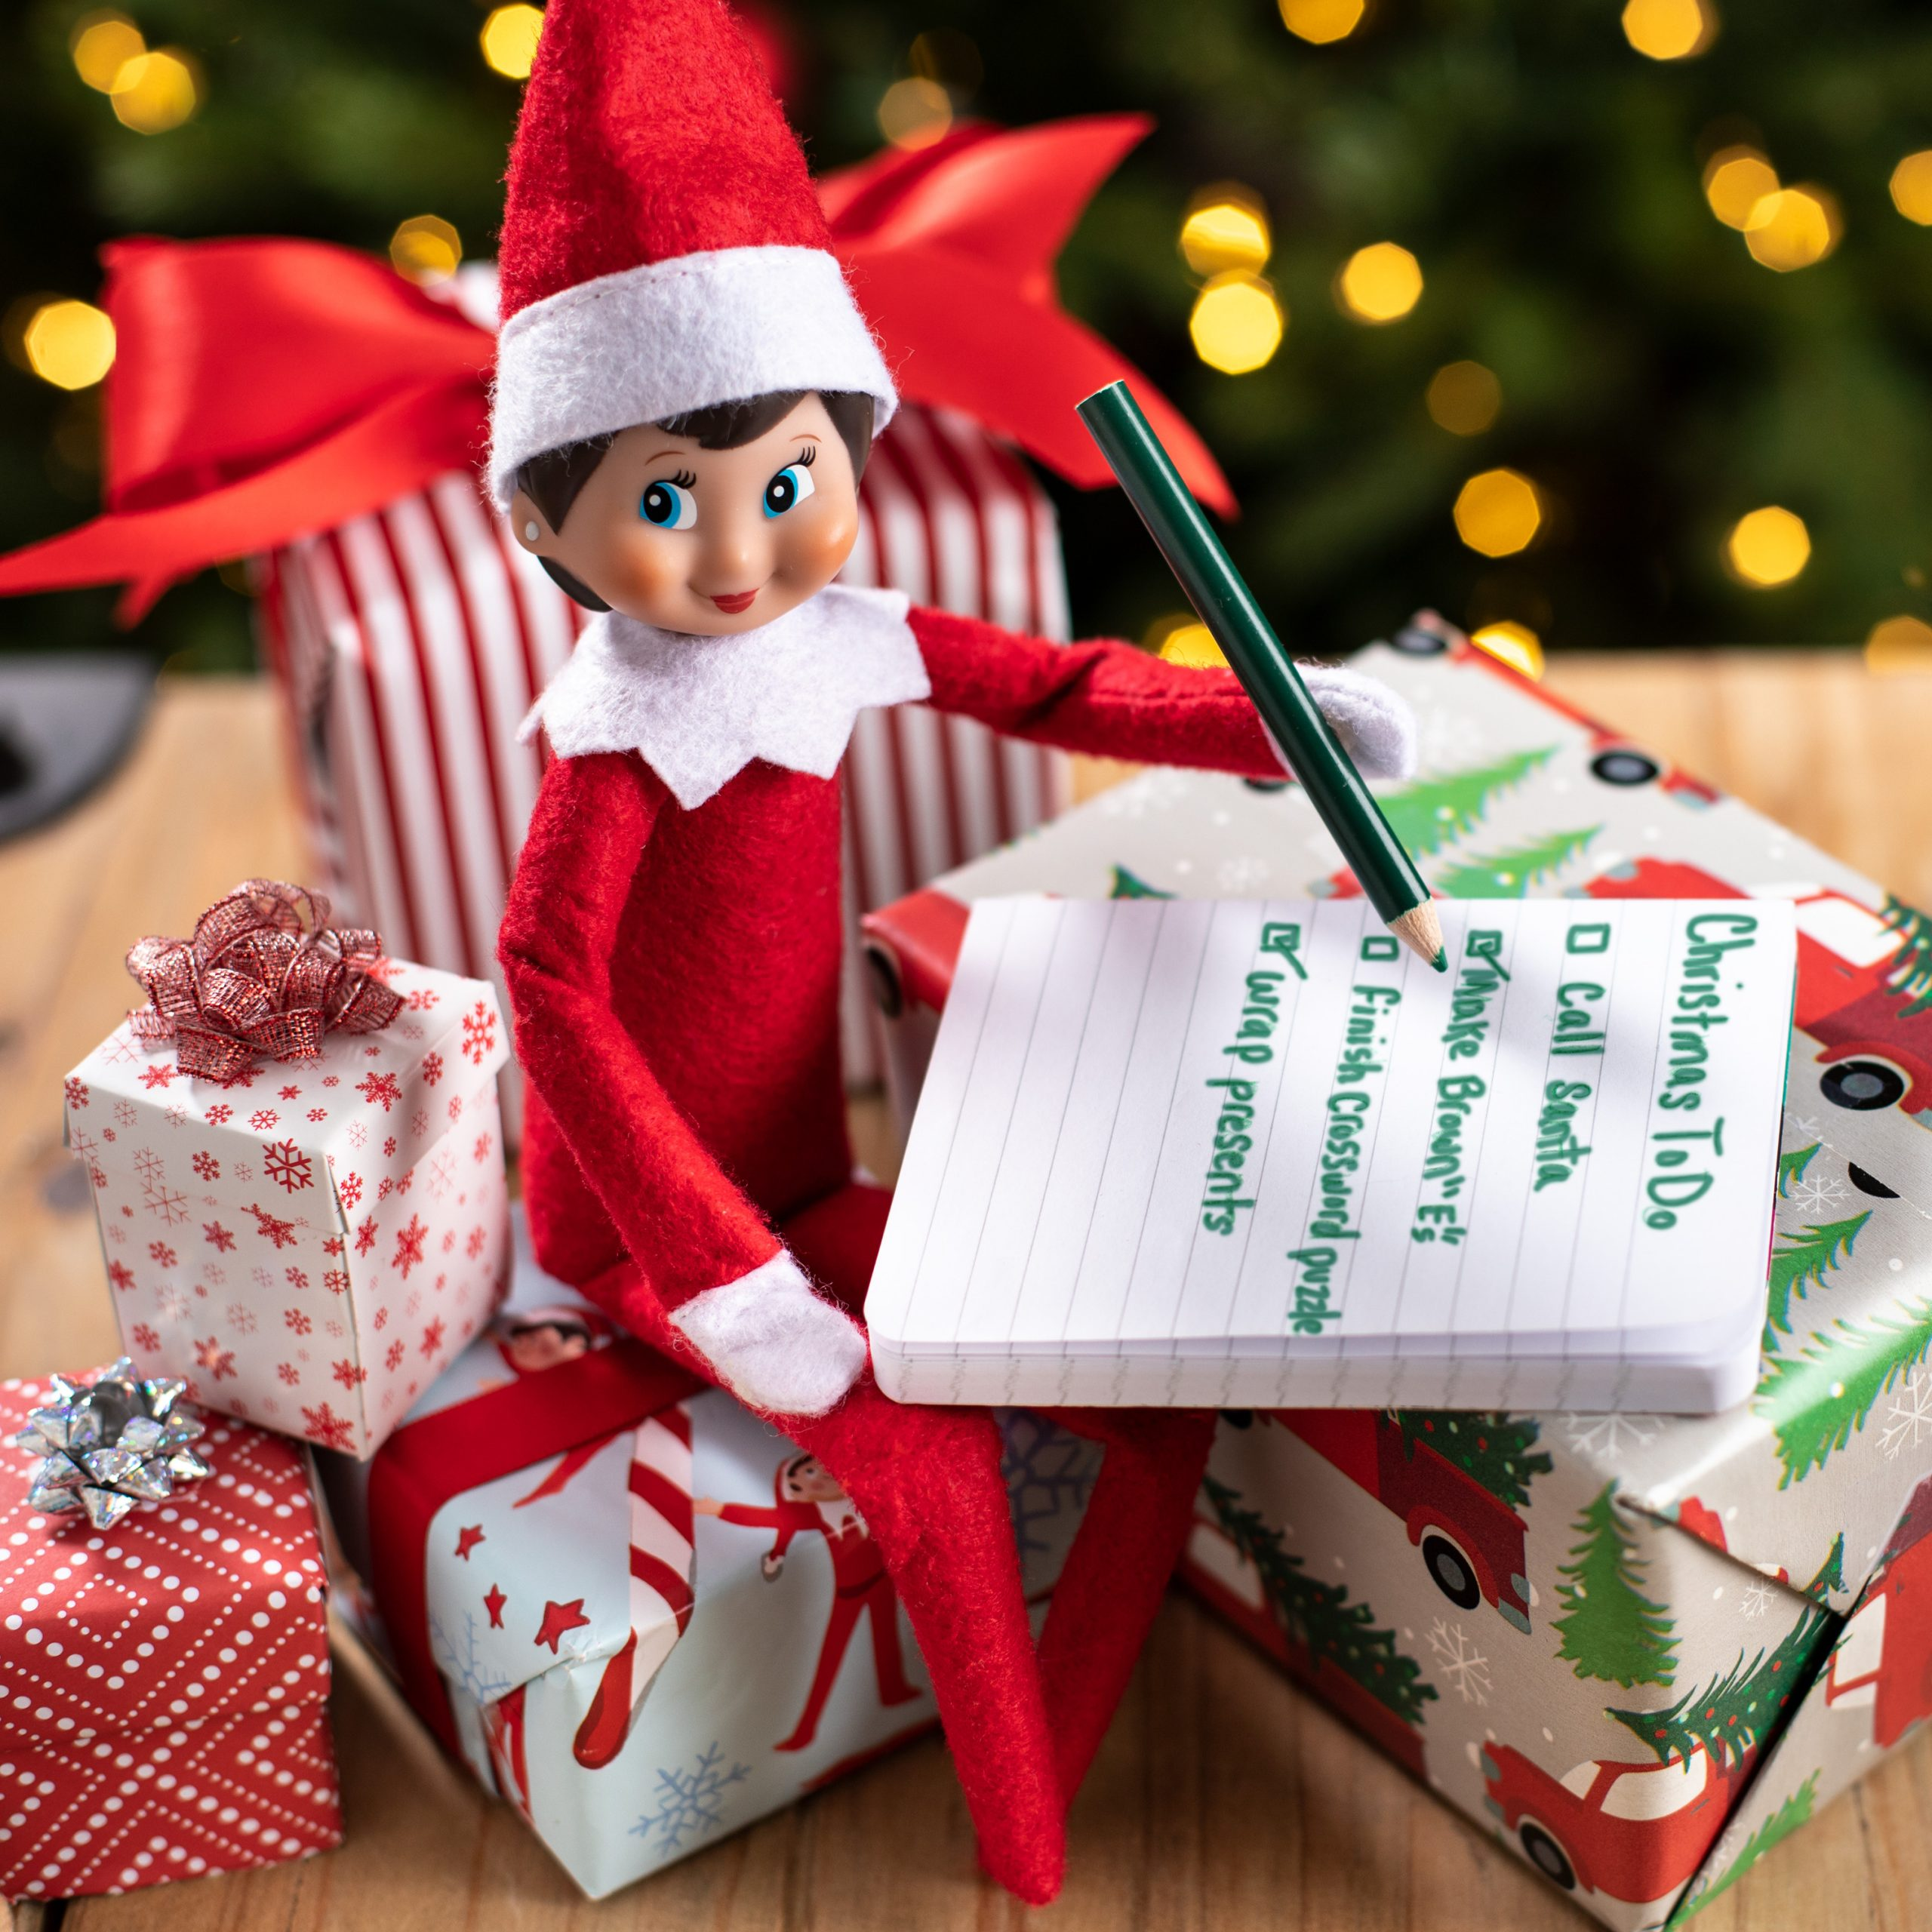 Elf making to-do list